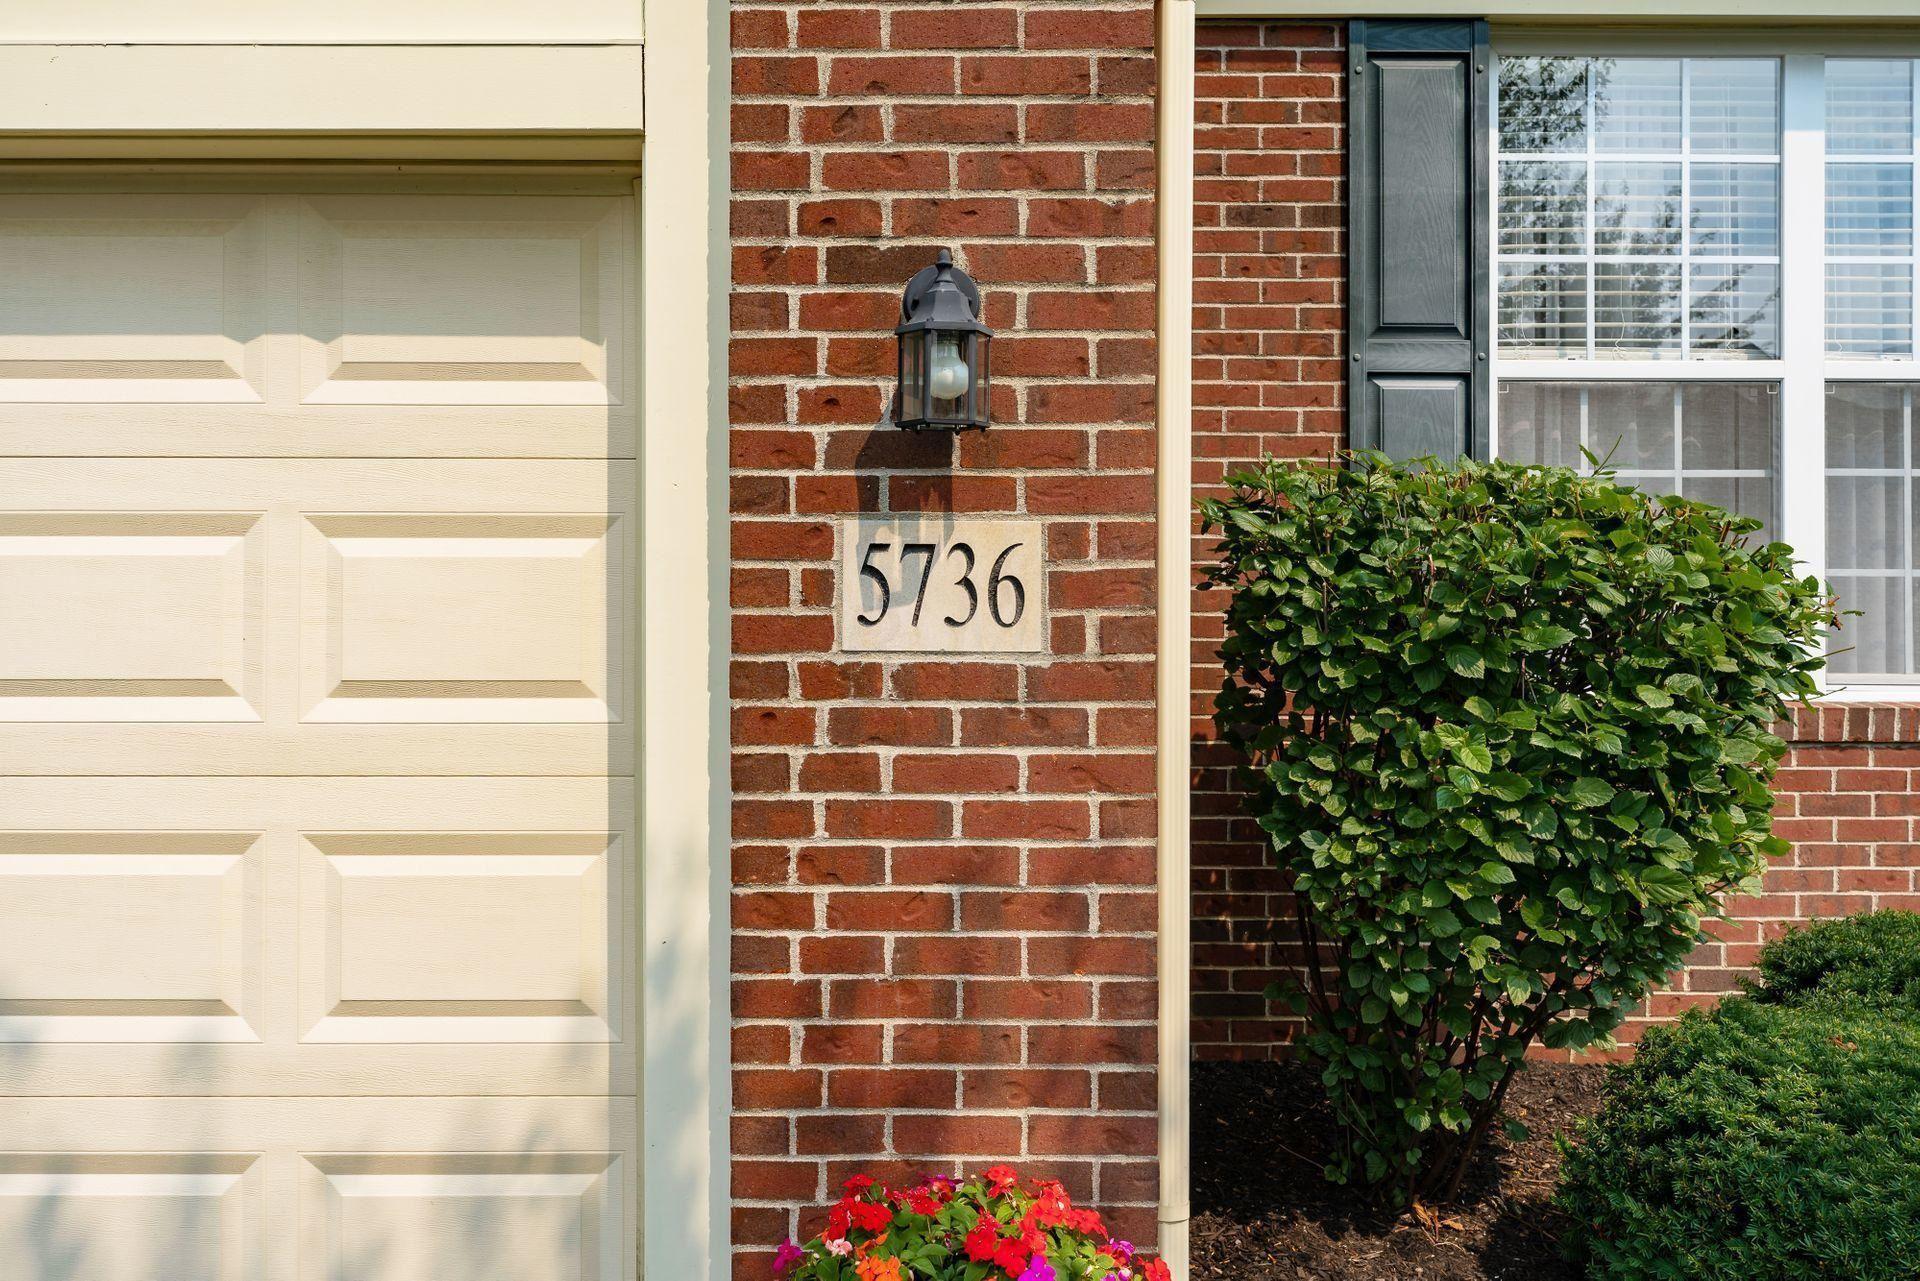 Photo of 5736 Burke Circle #503, New Albany, OH 43054 (MLS # 221027618)